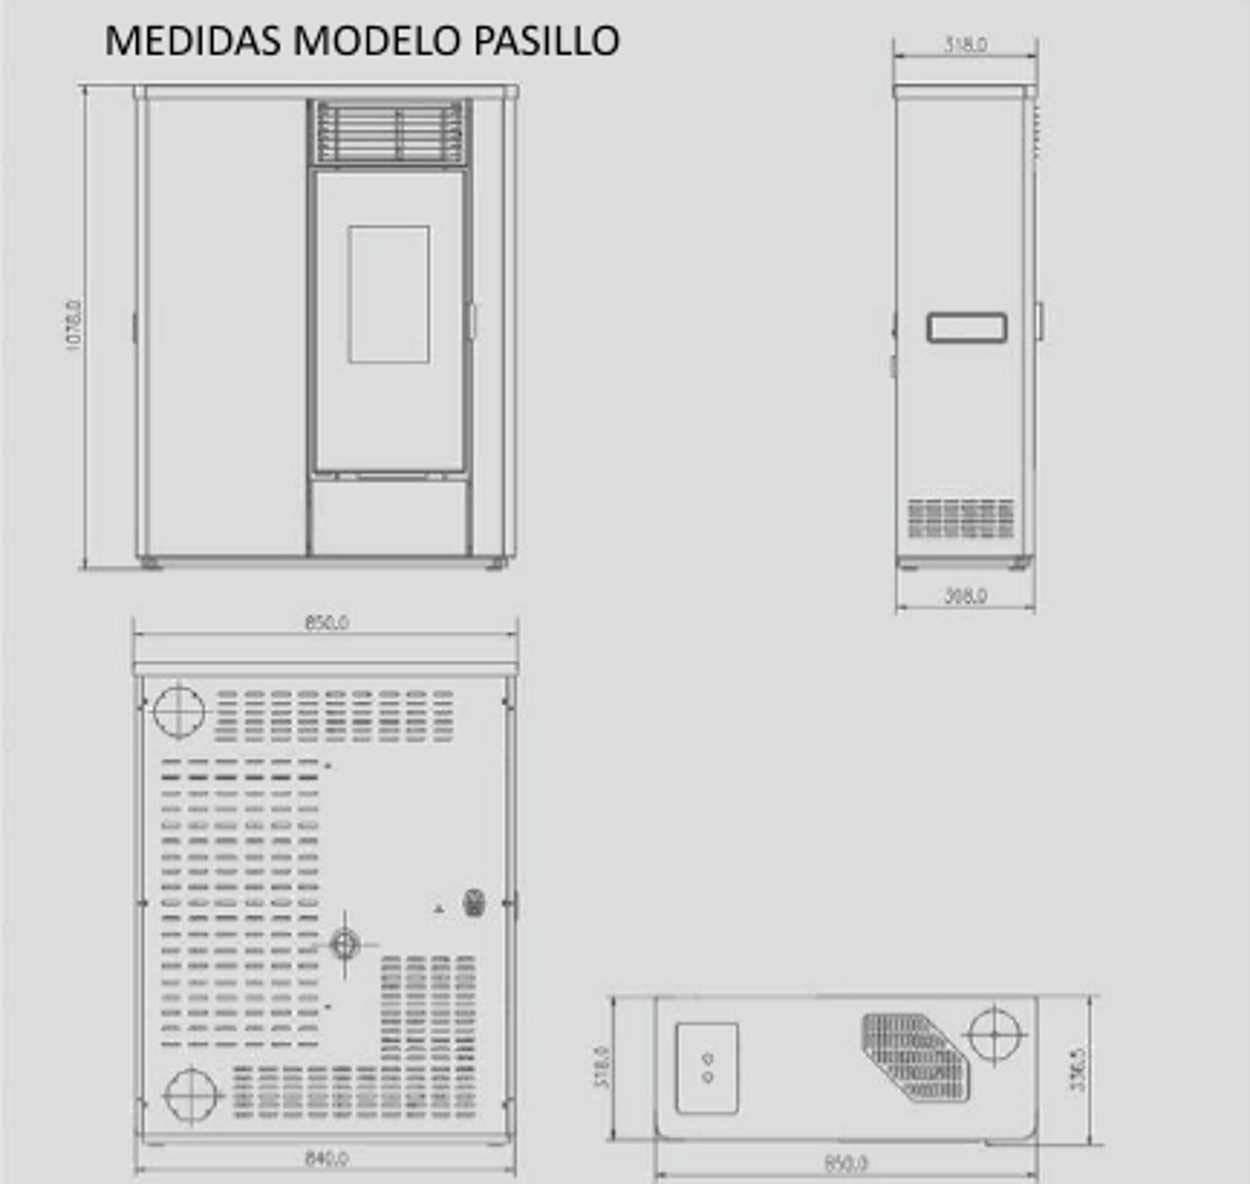 ECOMONT Estufa DE PELLETS DE Pasillo CANALIZABLE Doble TURBINA Blanco 12,5 KW: Amazon.es: Hogar